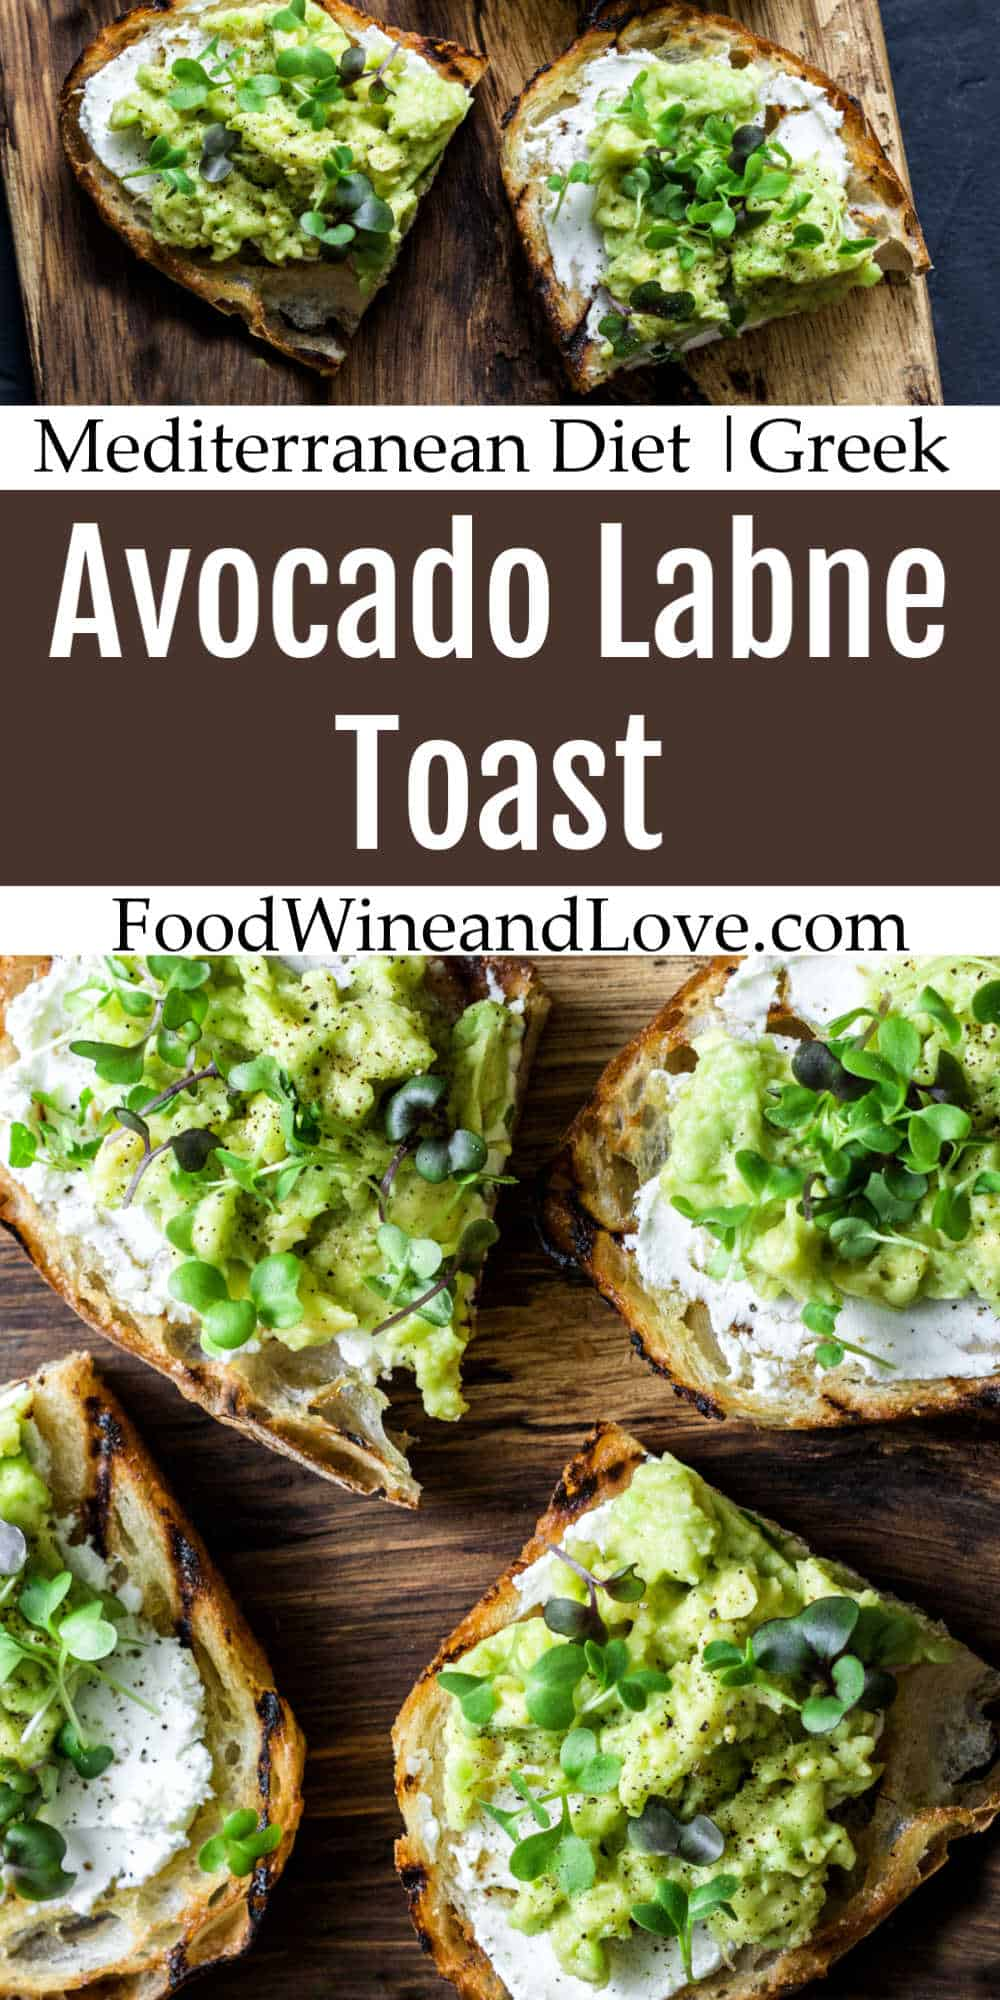 Avocado Labne Toast